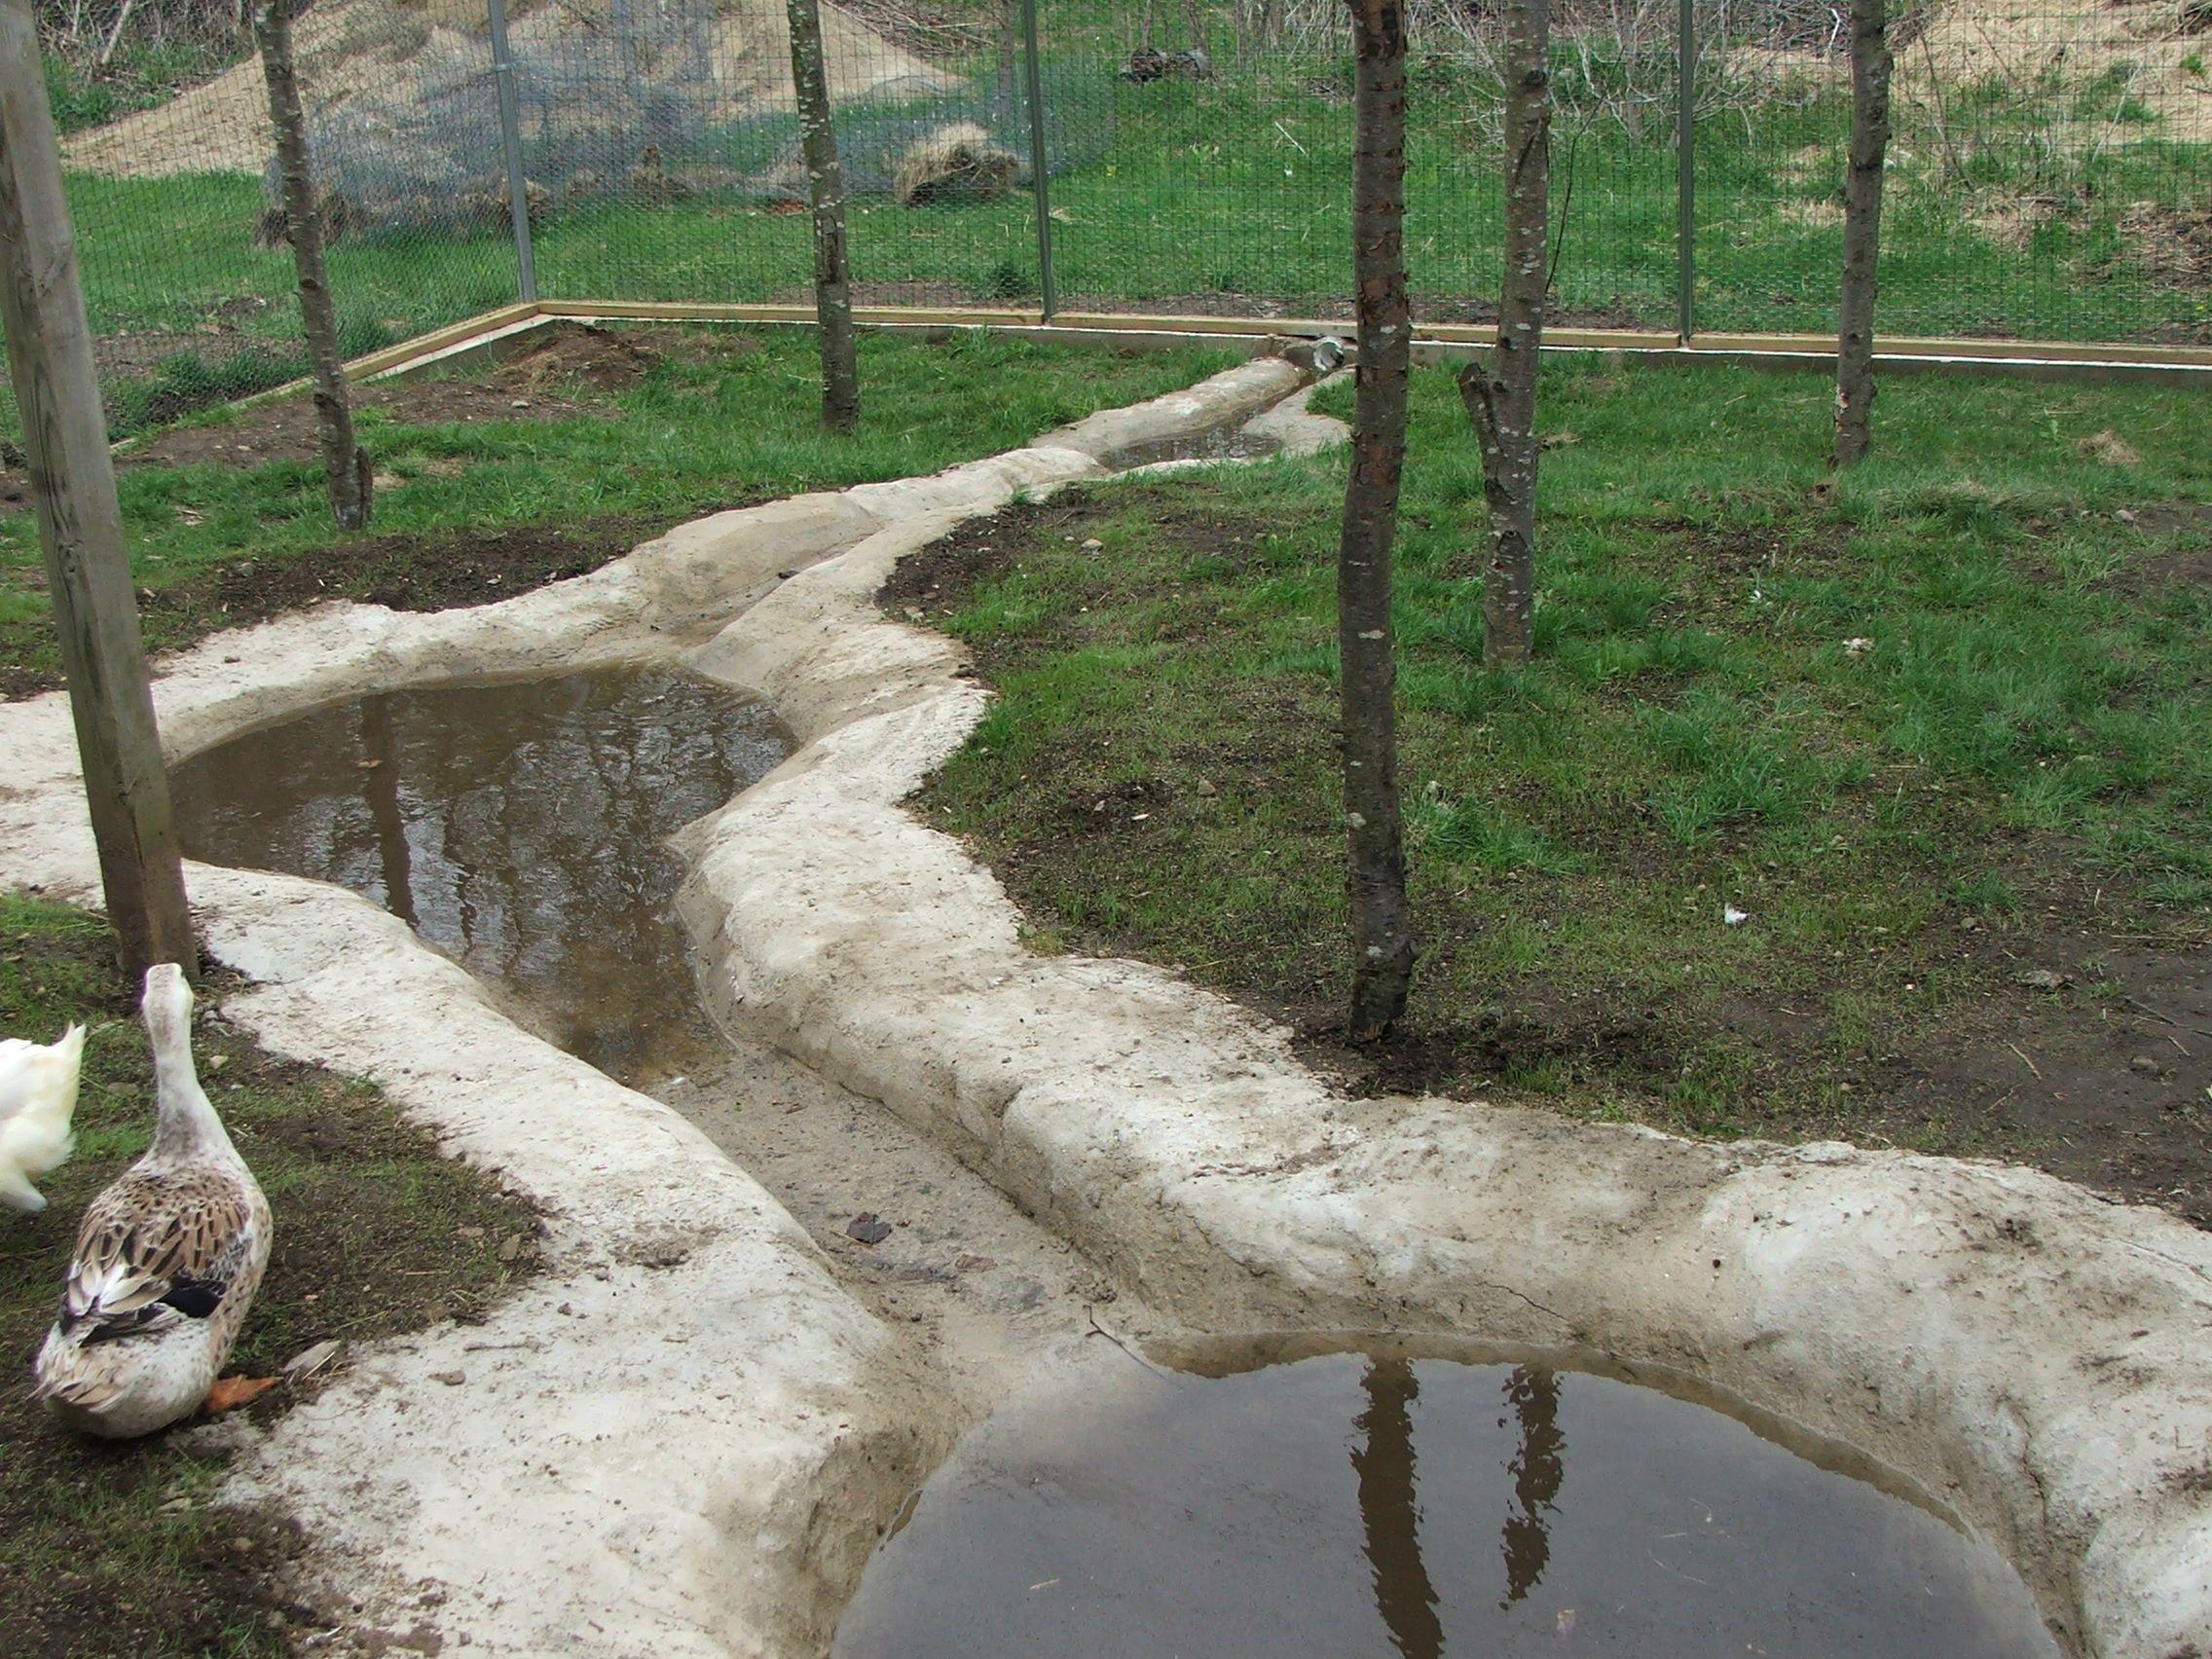 Building a predator proof pen backyard ducks duck pond